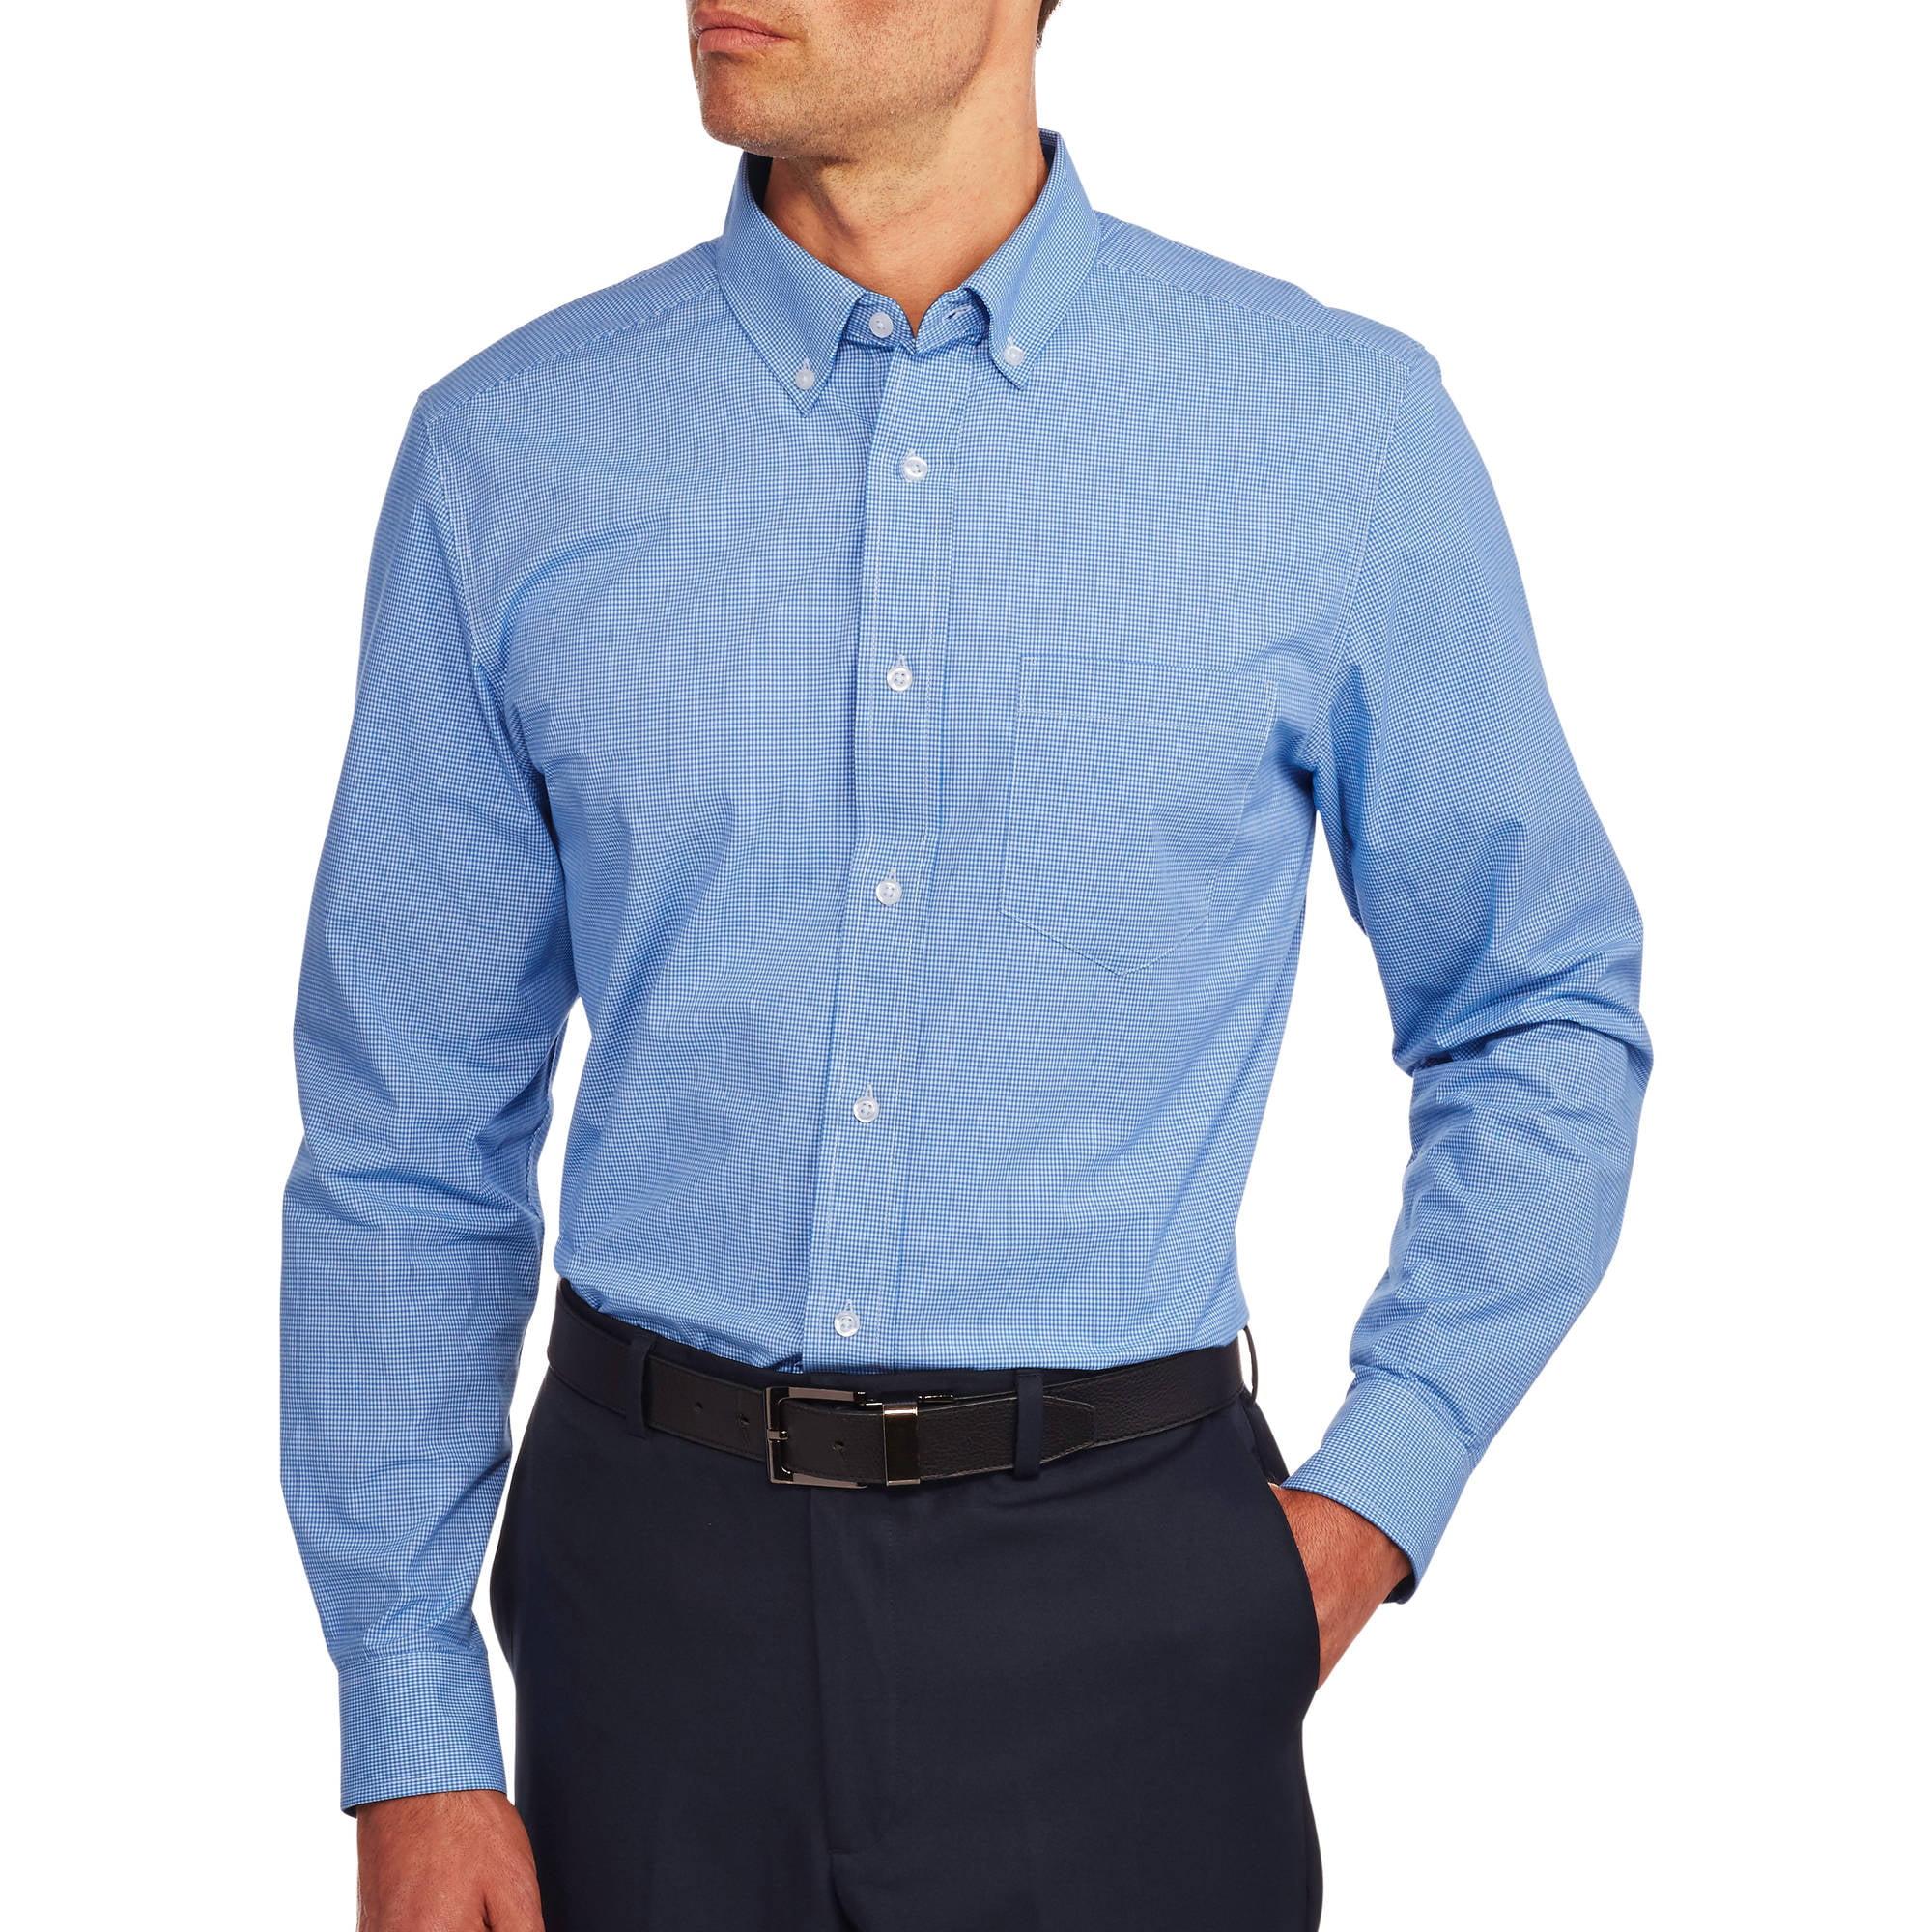 Long sleeve black collared dress shirt